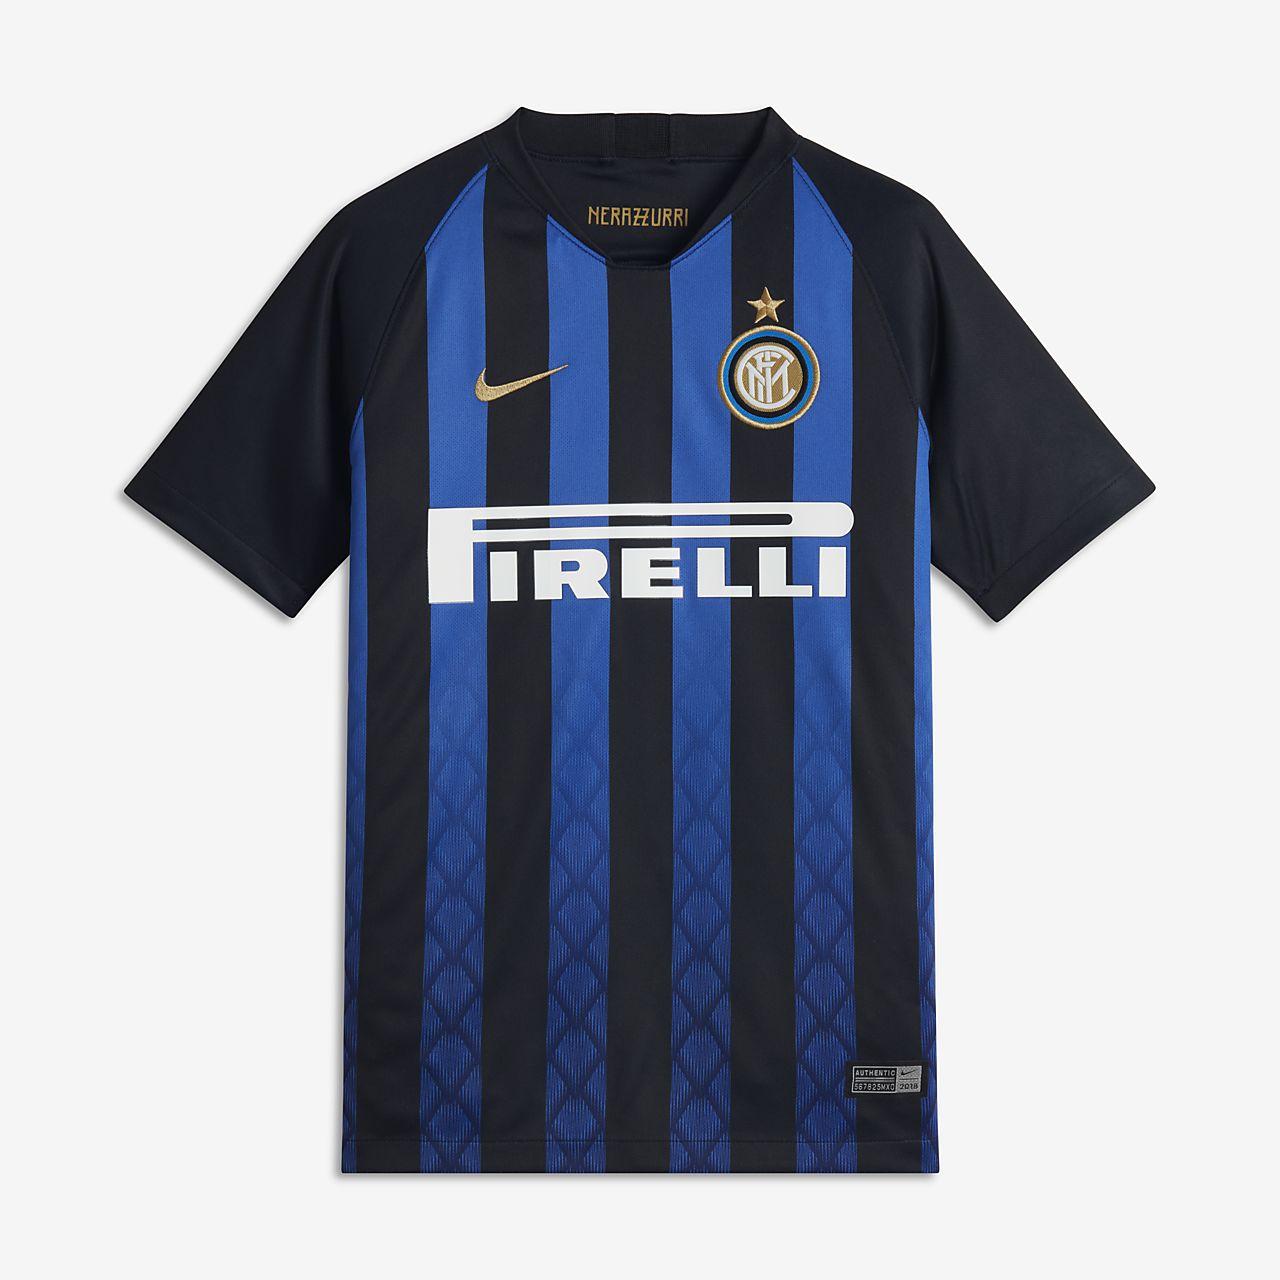 2018/19 Inter Mailand Stadium Home Fußballtrikot für ältere Kinder